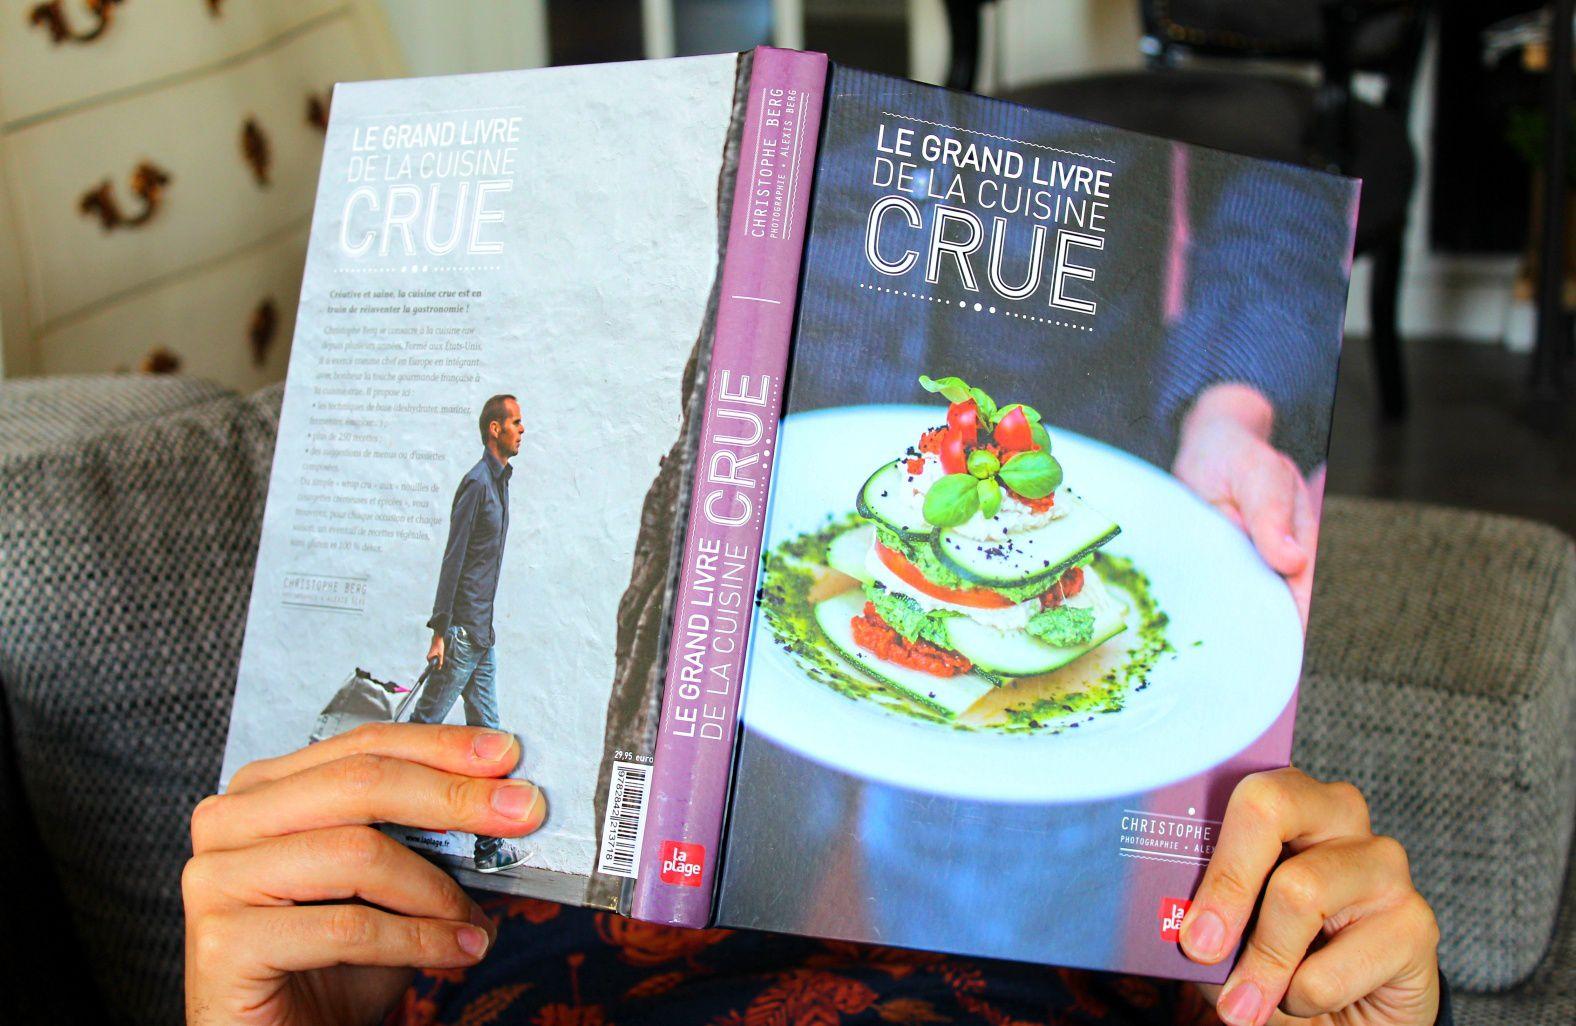 Concours &quot&#x3B;Le Grand Livre de la Cuisine Crue&quot&#x3B; à Gagner &amp&#x3B; Résultats - Natura Sense